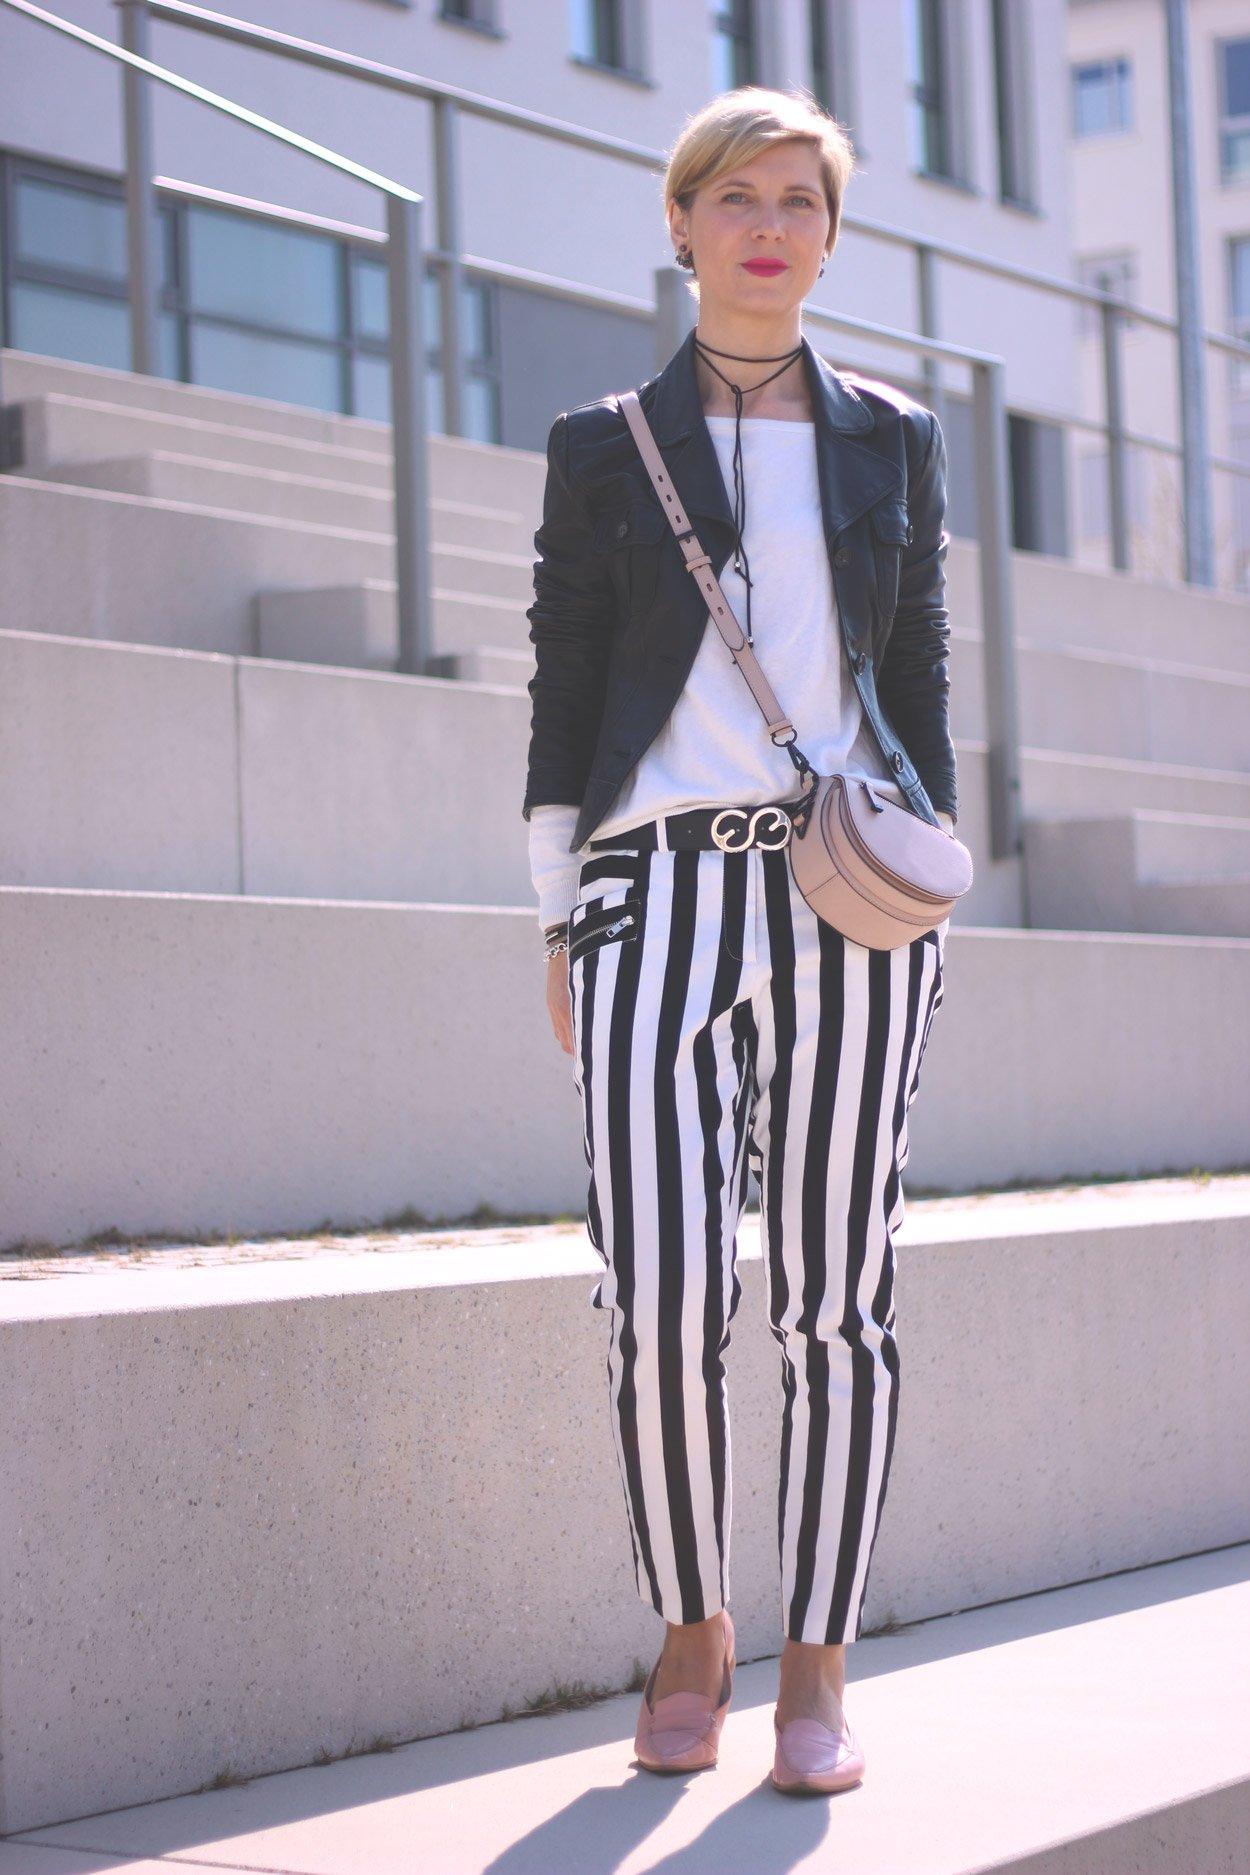 Schwarz-weiß und Streifen, casual, black and white, choker, Stripes, Lederjacke, Conny Doll